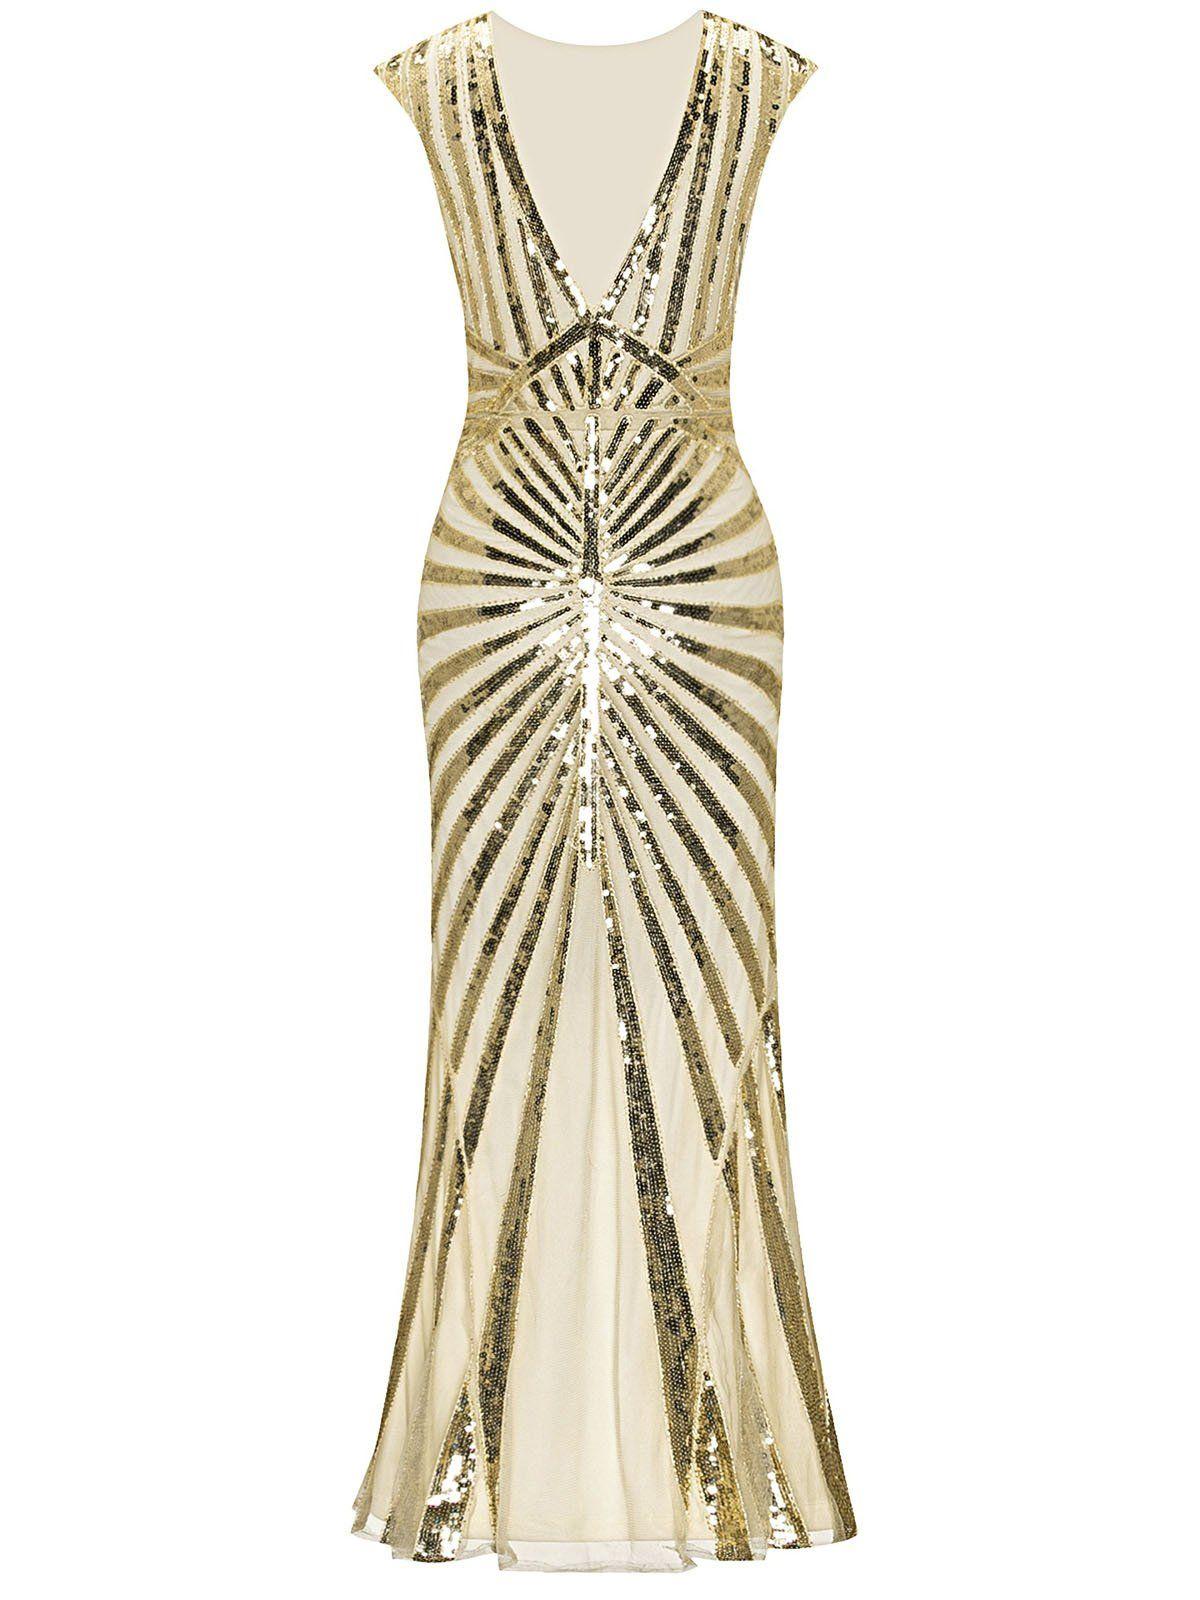 S sequin art deco maxi dress my style pinterest vintage